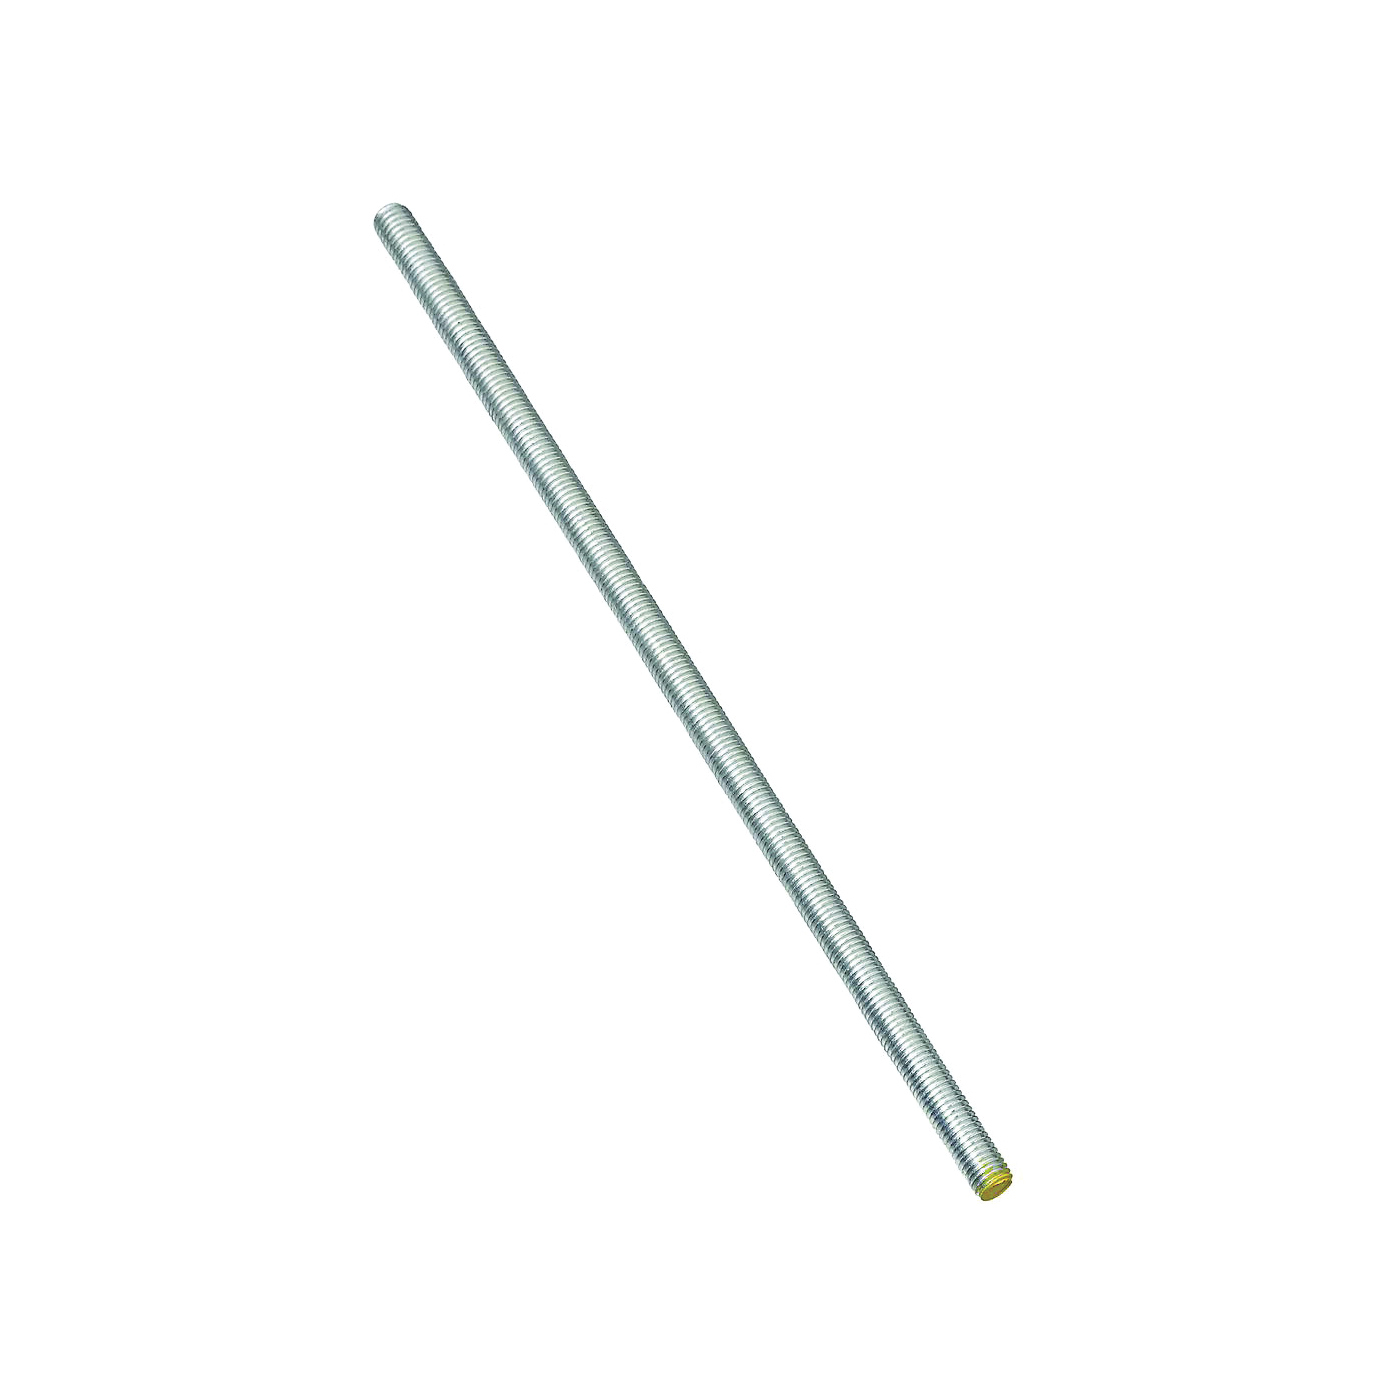 Picture of Stanley Hardware 179515 Threaded Rod, 3/8-16 Thread, 36 in L, A Grade, Steel, Zinc, UNC Thread